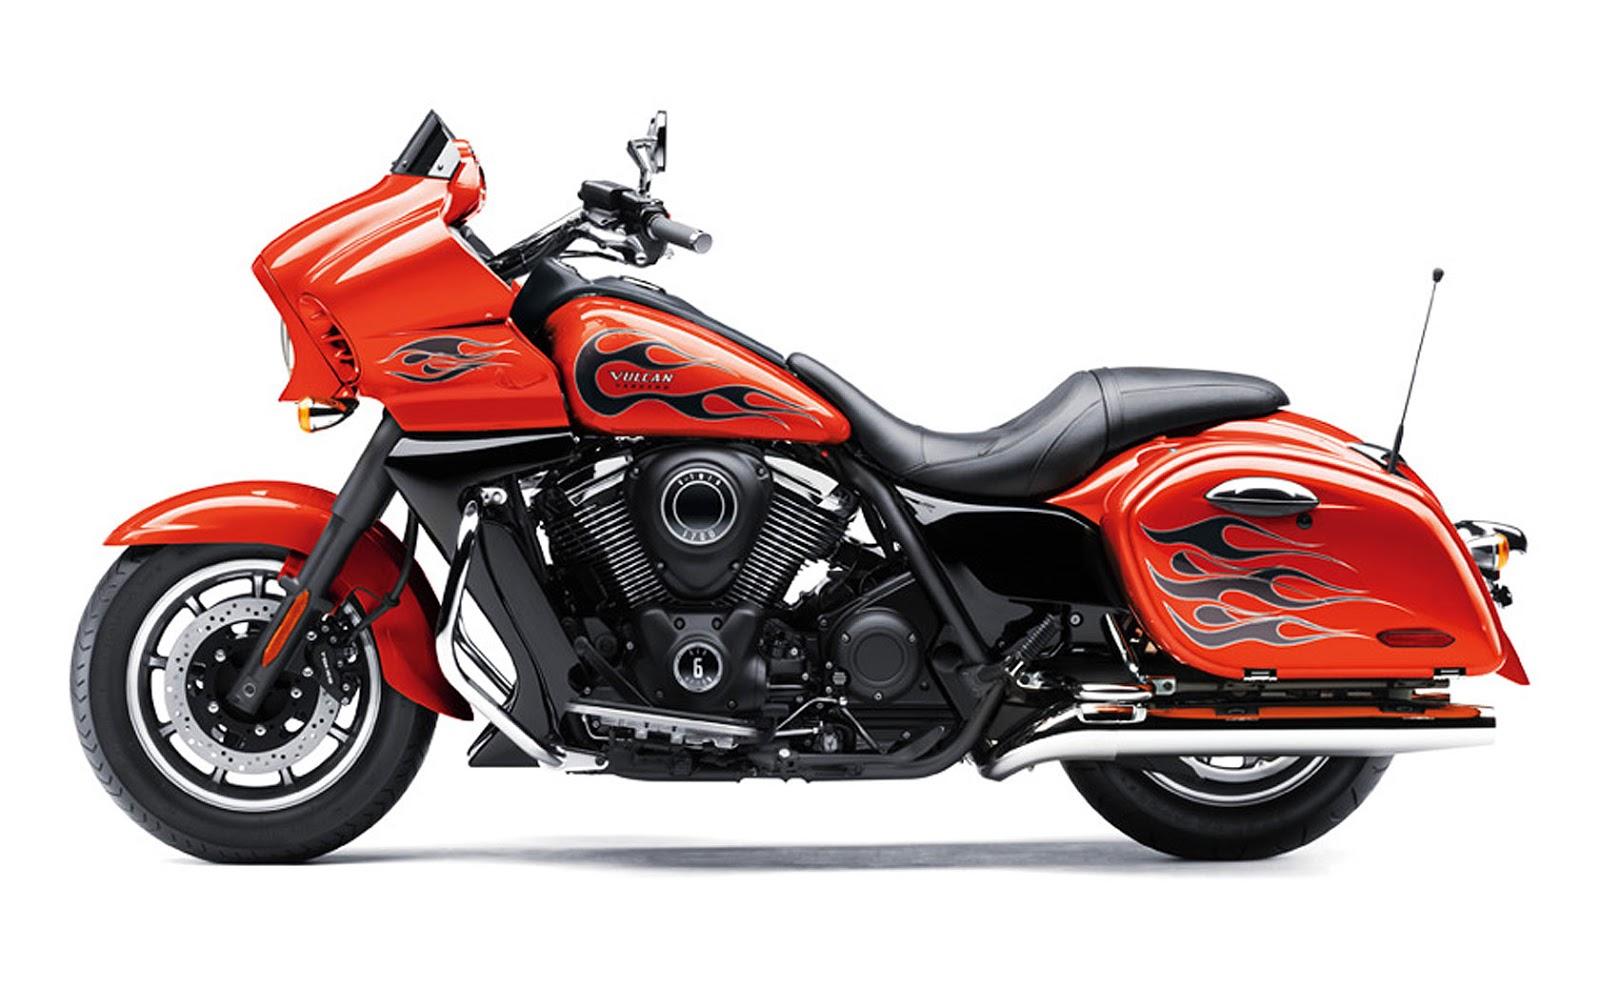 Maxresdefault as well Big Wheel Vulcan likewise  additionally Kawasaki Vulcan Vaquero additionally Dscn. on 2014 kawasaki vulcan 900 custom